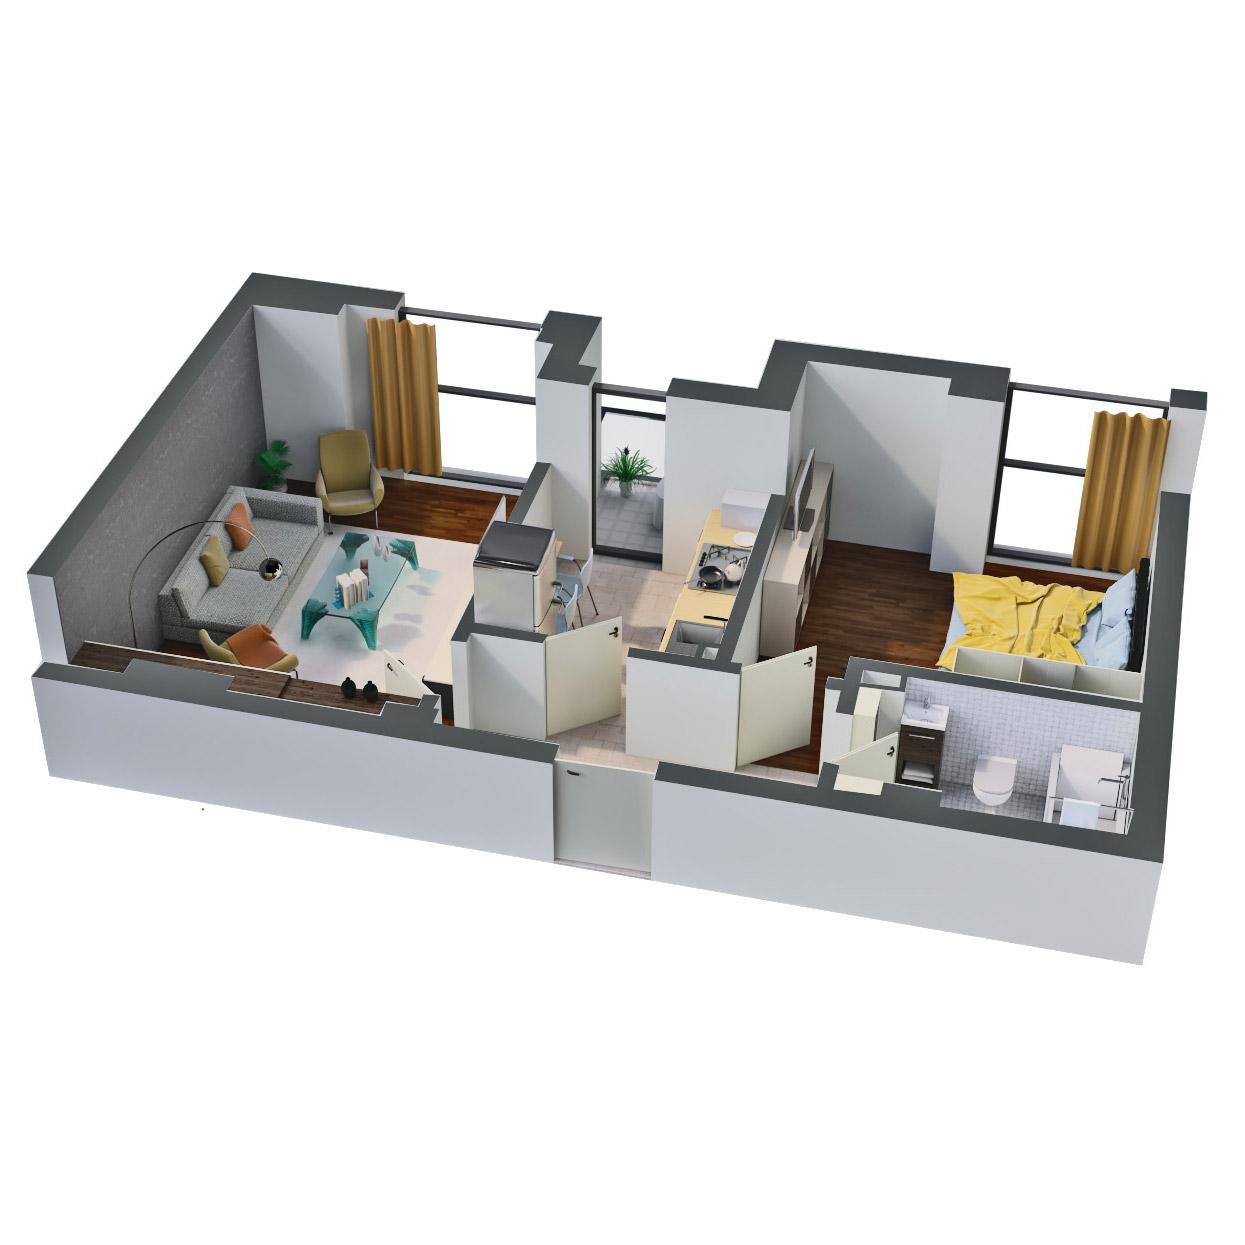 Apartament 2 camere de vanzare Bucuresti - Catedral Residence - Marriott, Piata Unirii, 13 Septembrie, Izvor - Tip 1 - T1 - D